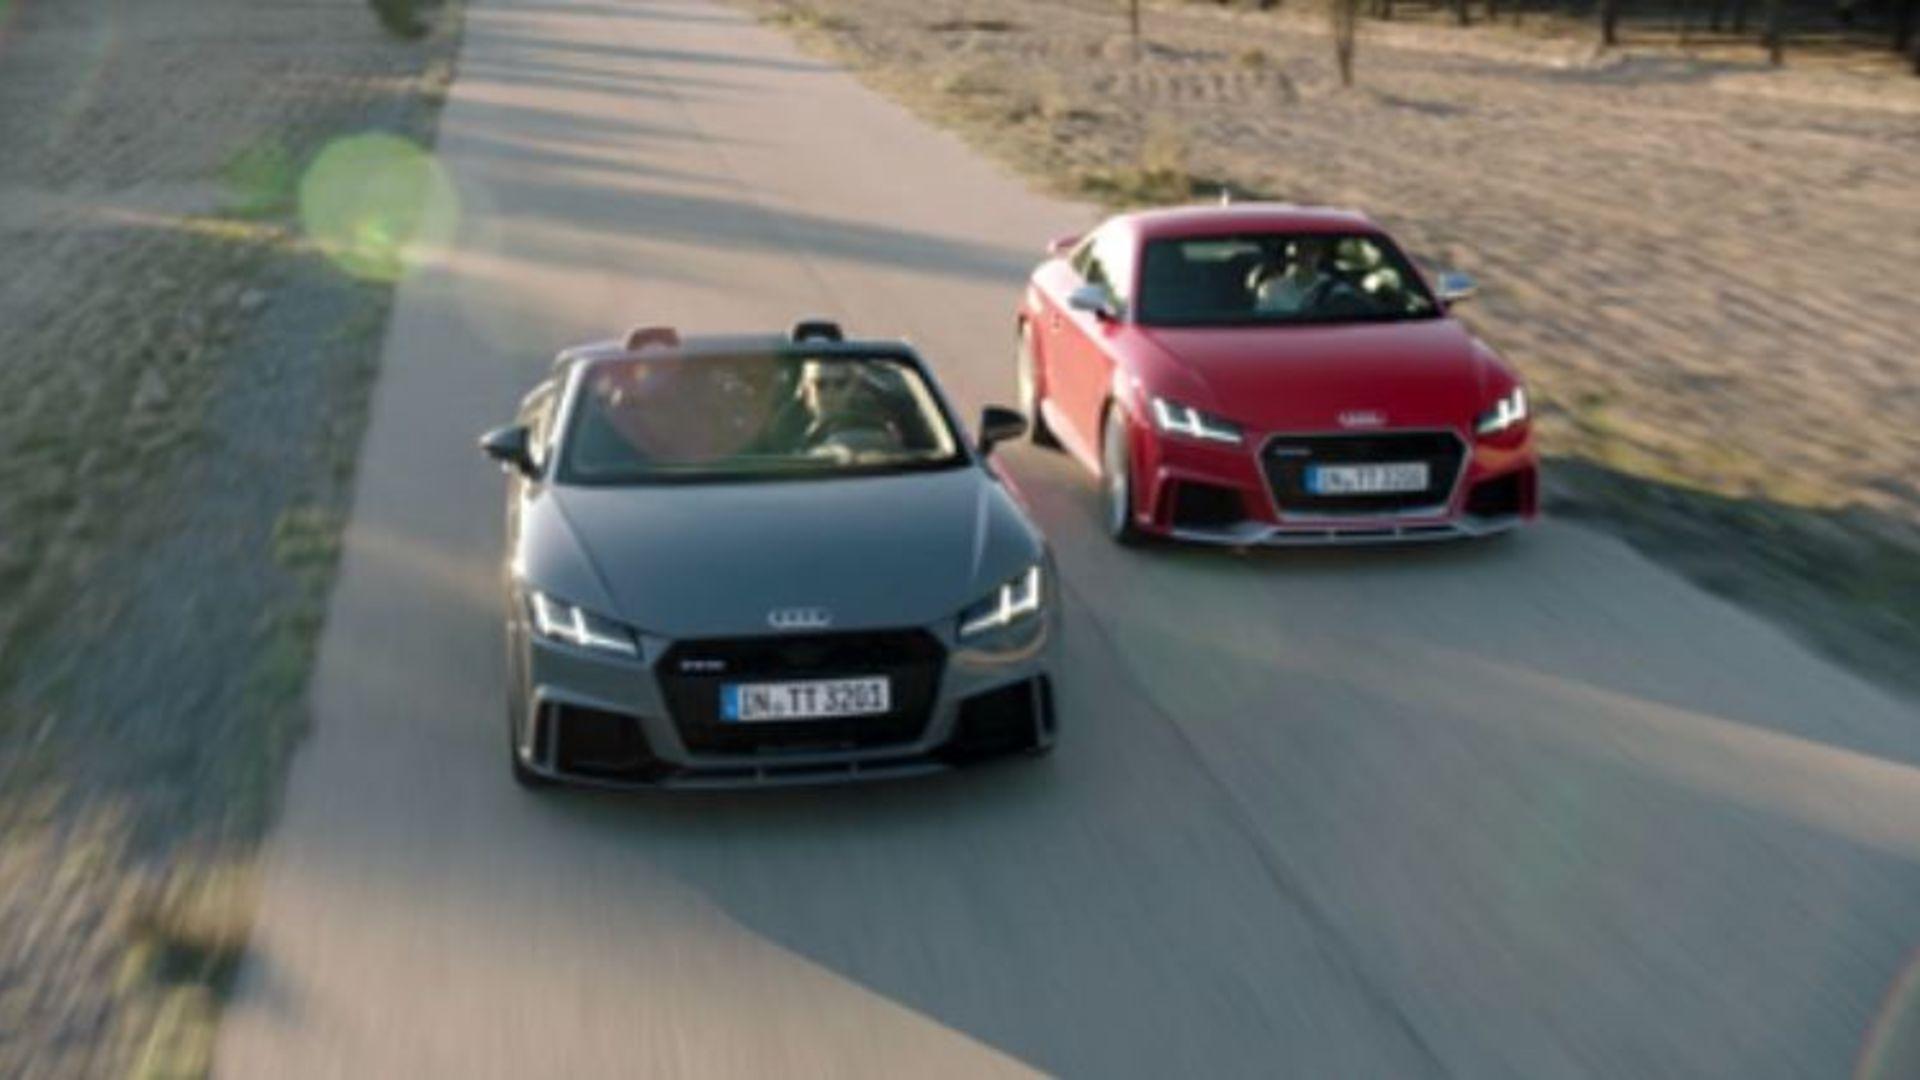 Dynamisches Doppel - TT RS Coupé und TT RS Roadster